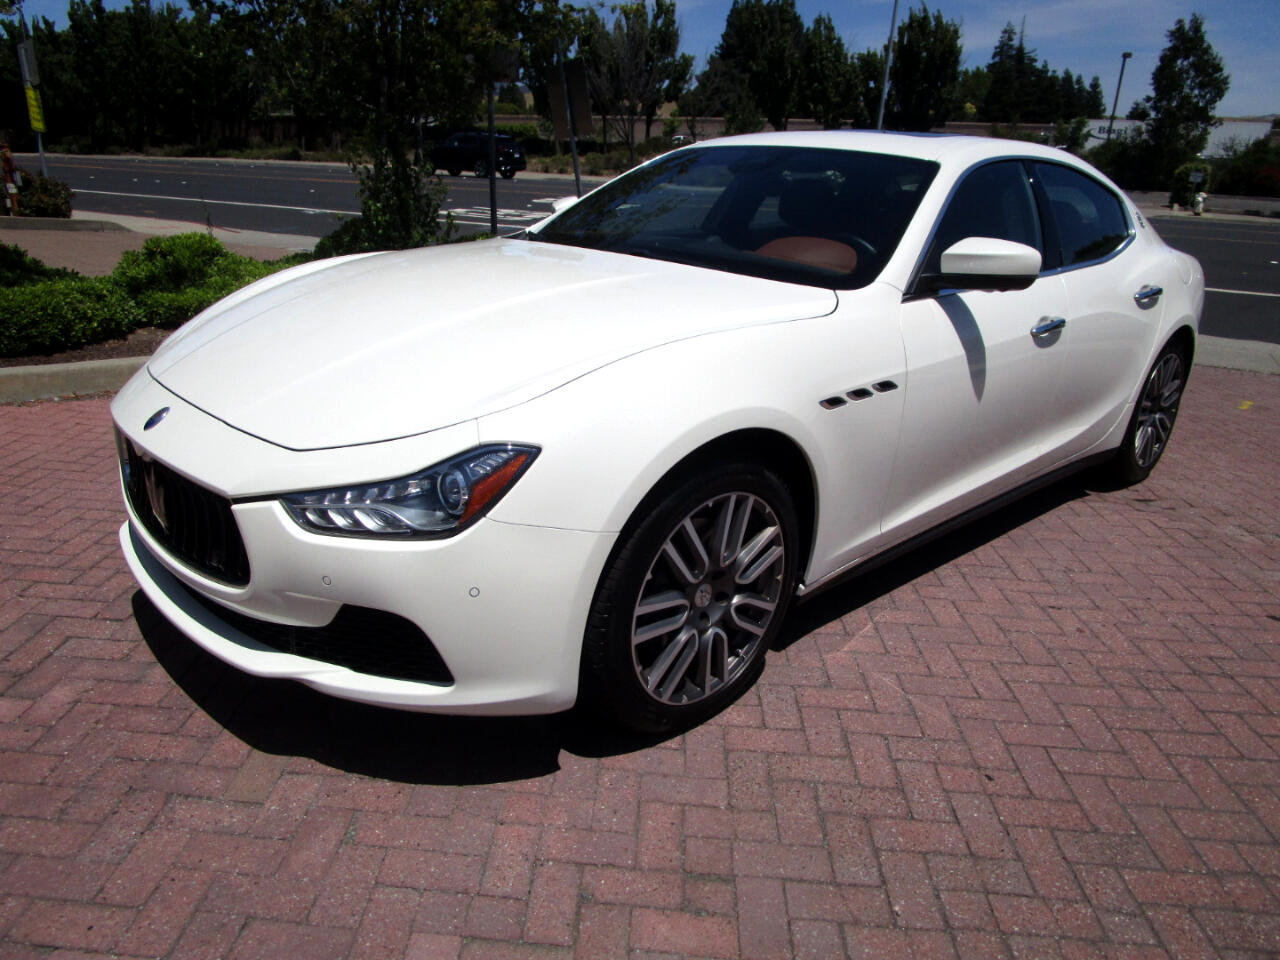 2017 Maserati Ghibli PREMIUM PKG*DRIVER ASSIST**PREM SOUND*HEAT SEATS*C